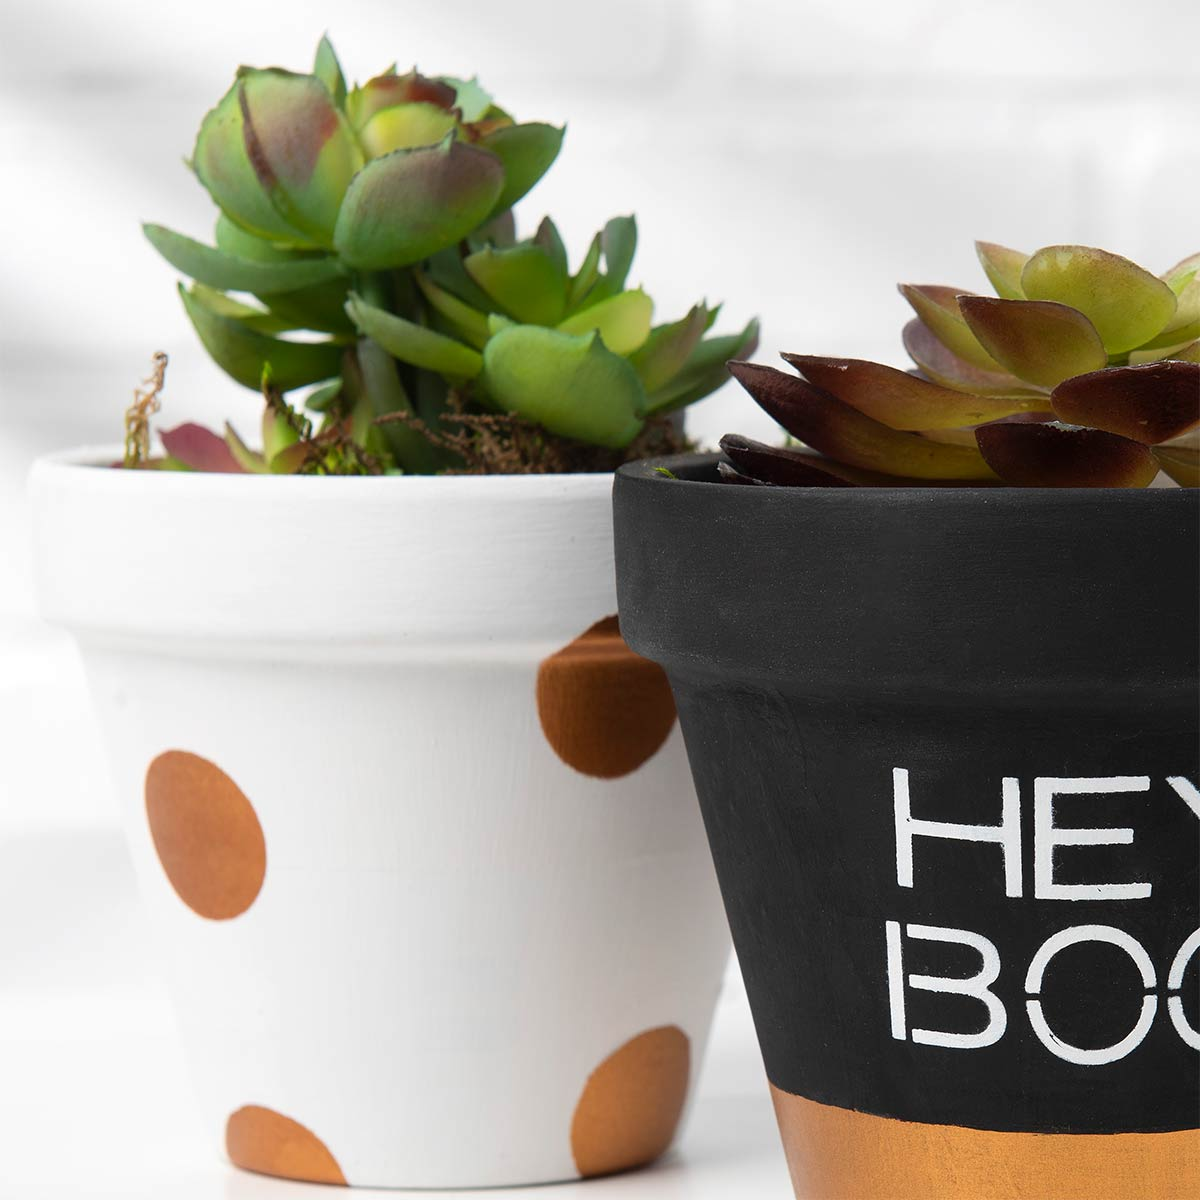 Hey Boo Planters